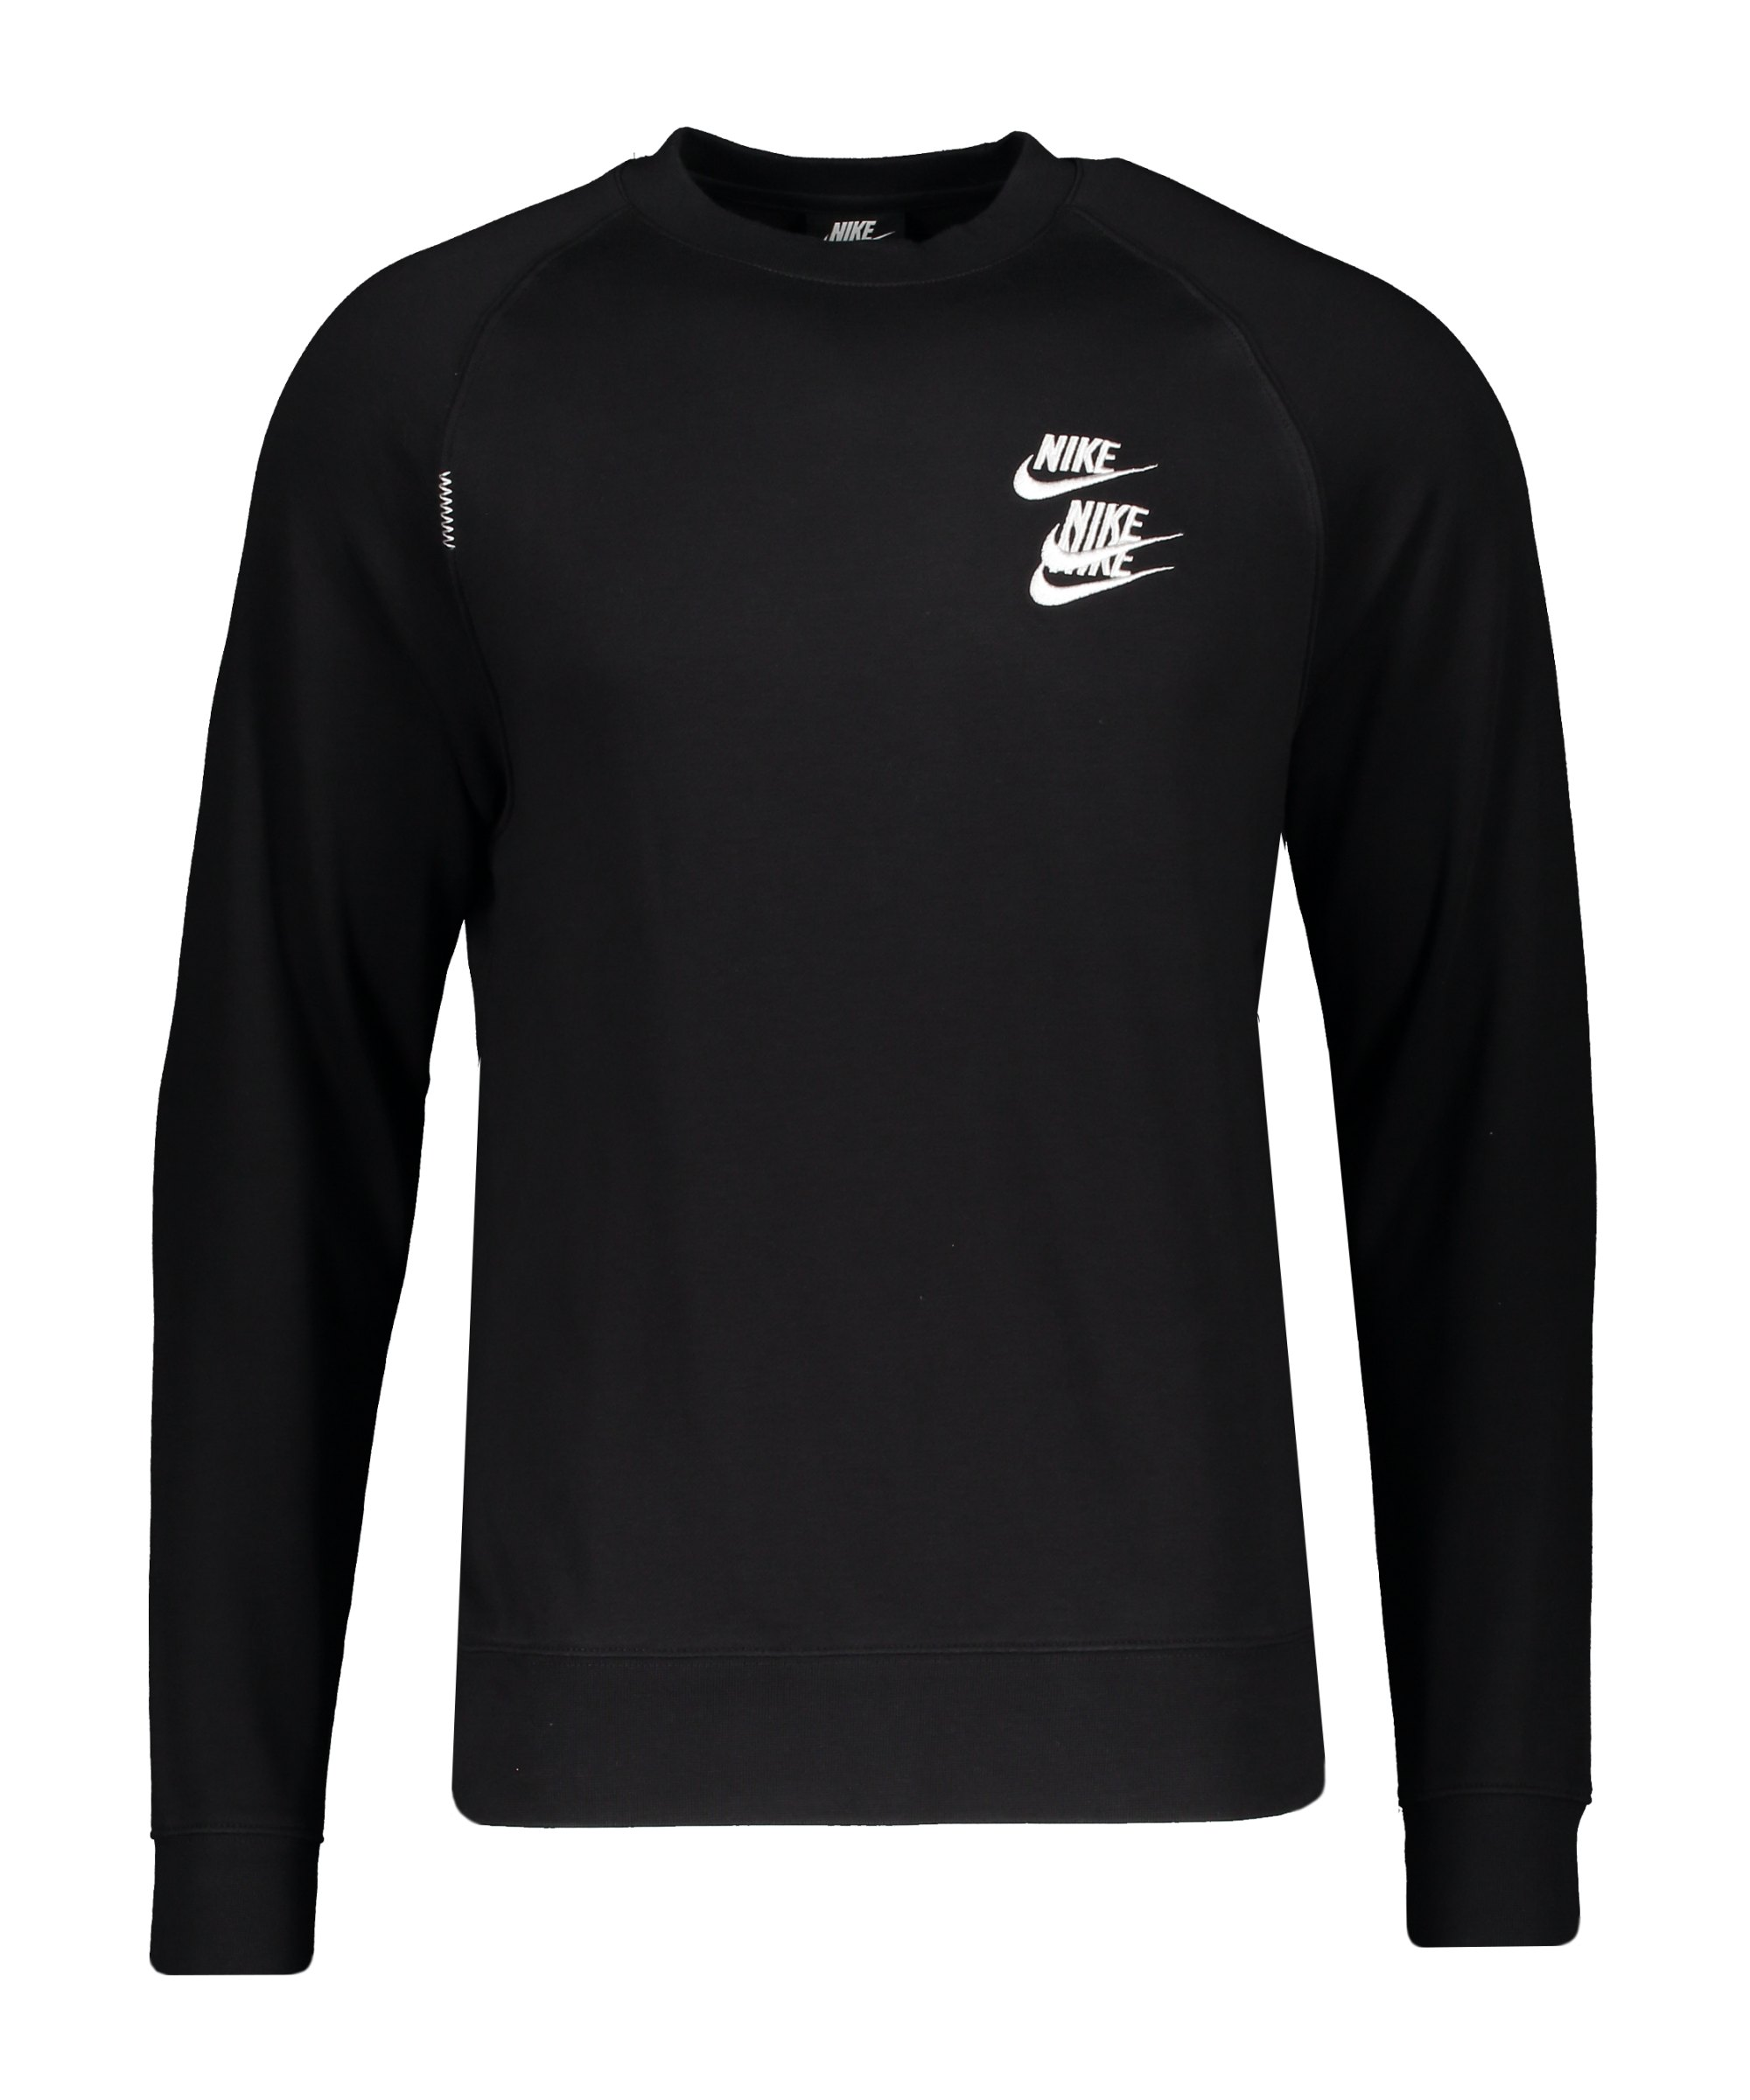 Nike World Tour Crew Sweatshirt Schwarz F010 - schwarz